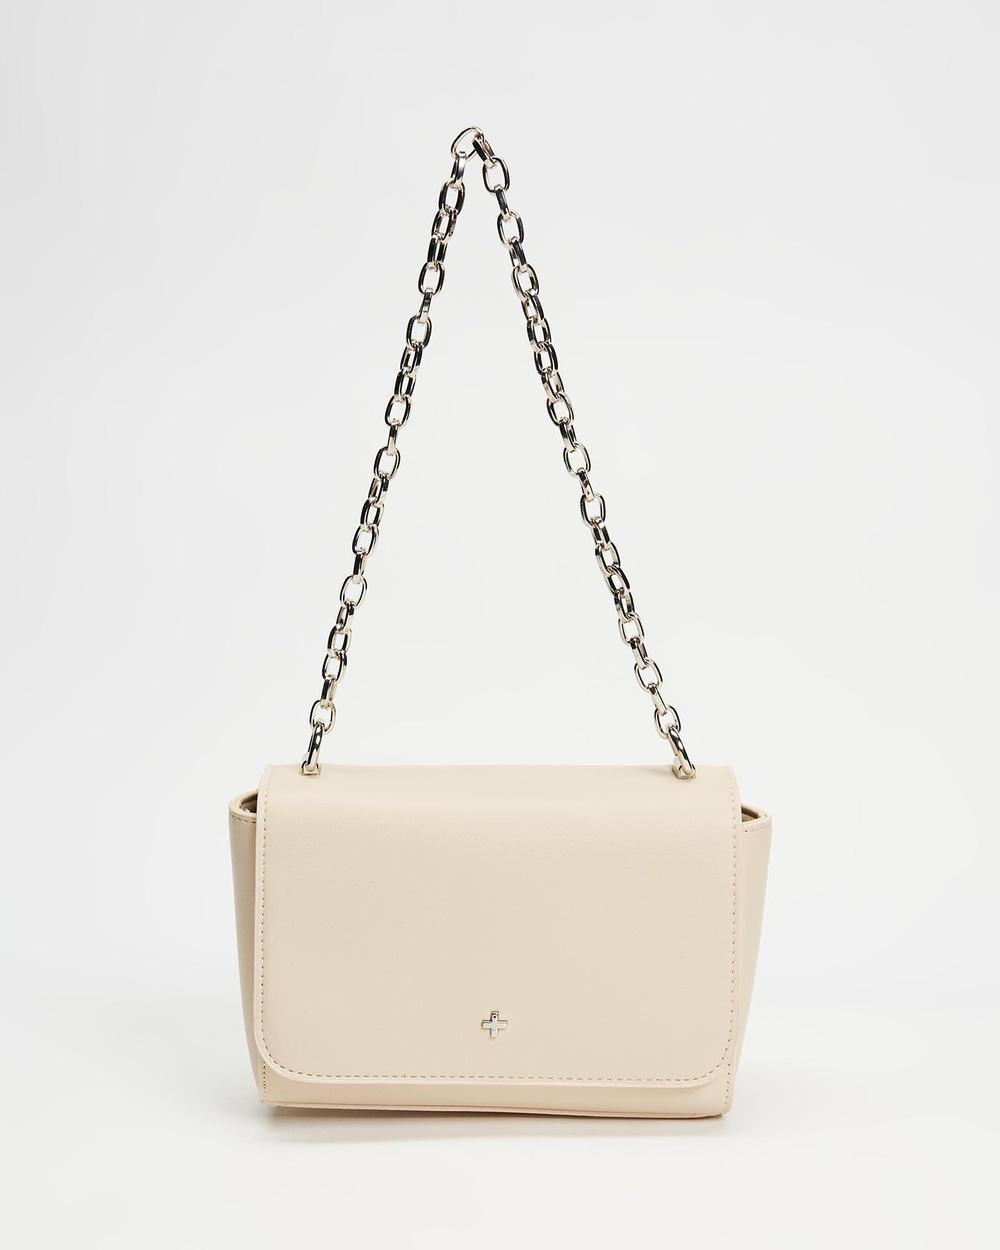 PETA AND JAIN Becca Handbags Nude Smooth Silver